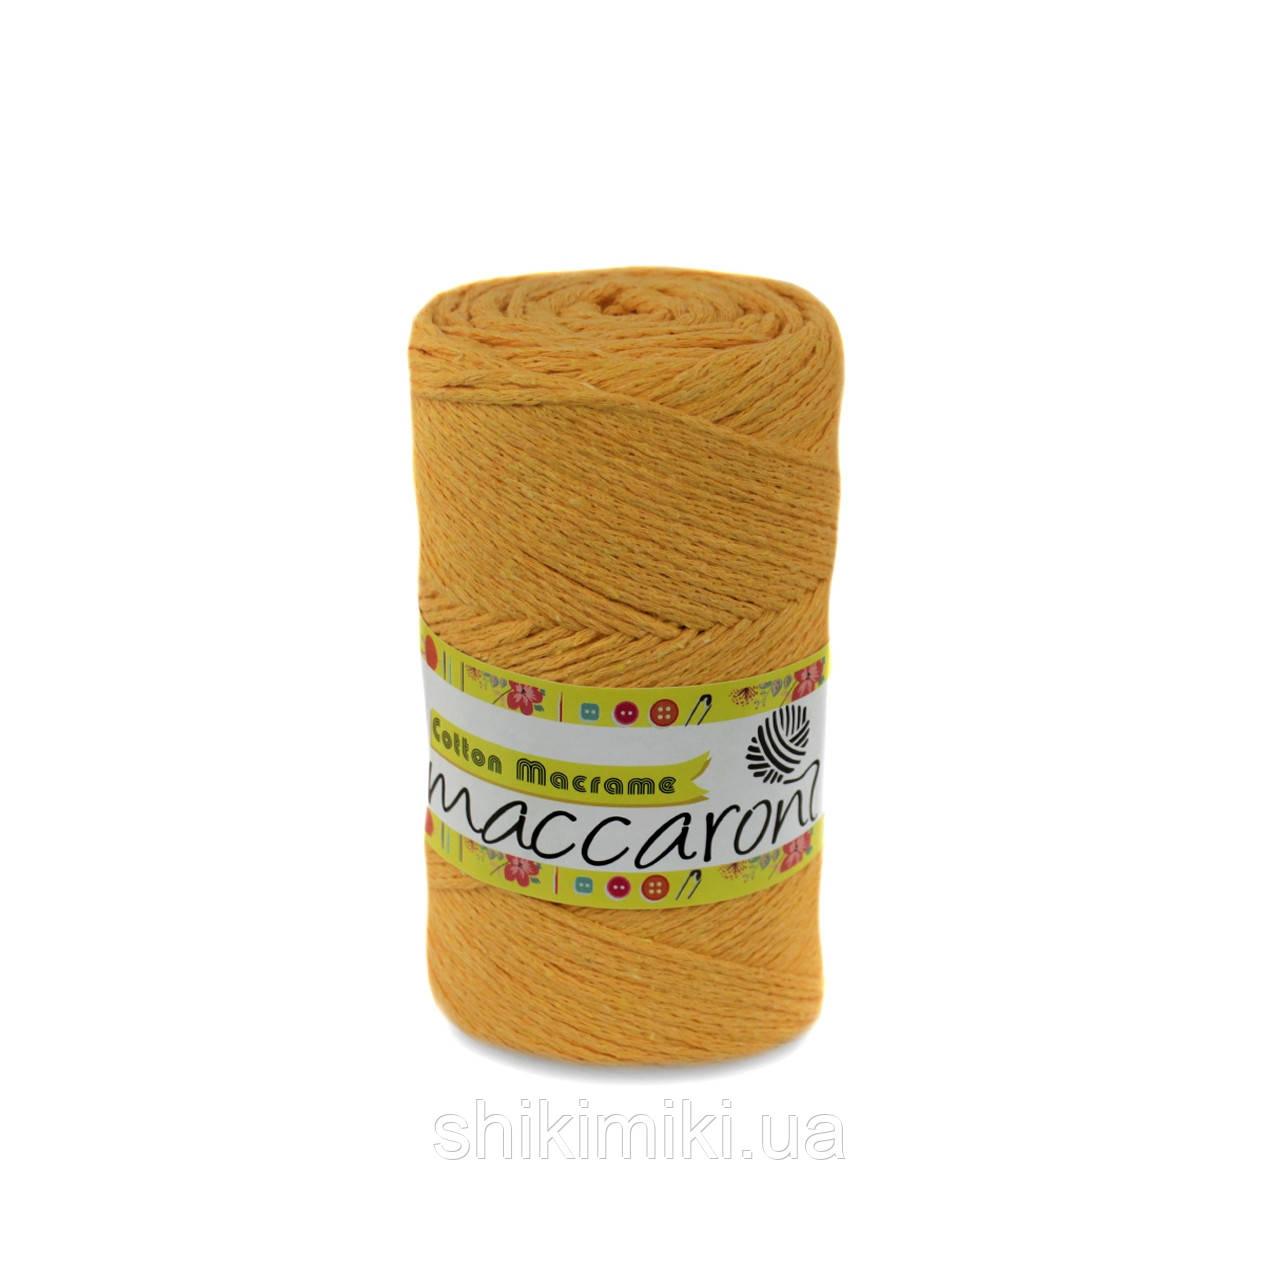 Эко Шнур Cotton Macrame, цвет Горчичный